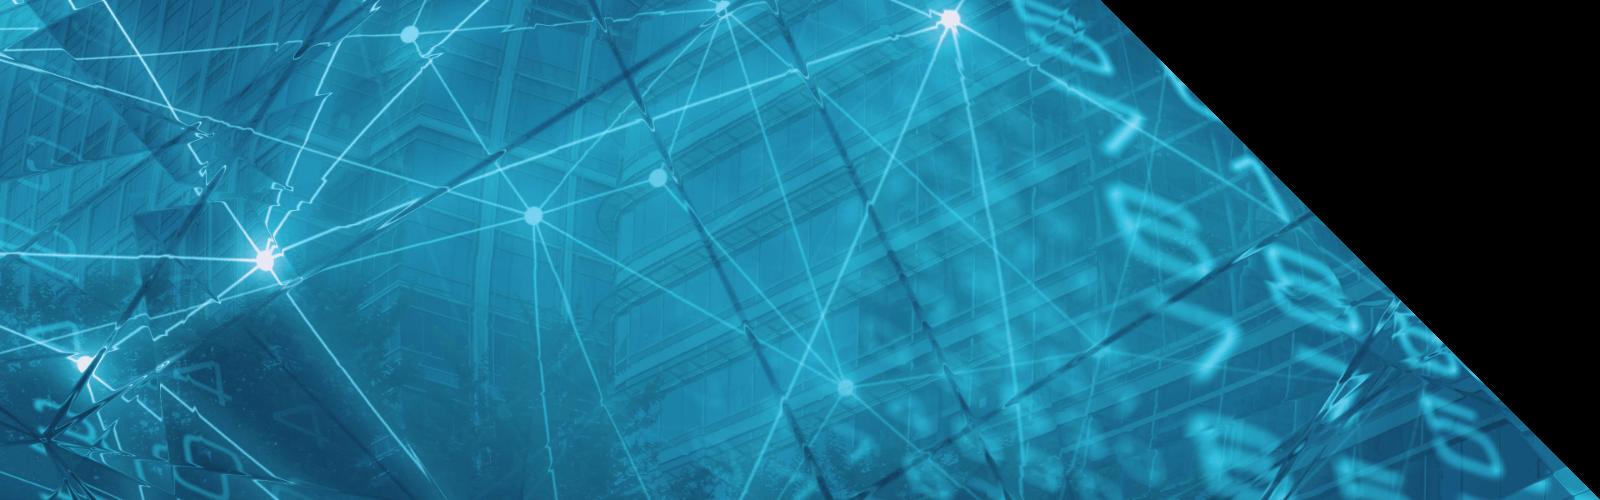 Digital Transformation デジタルトランスフォーメーション